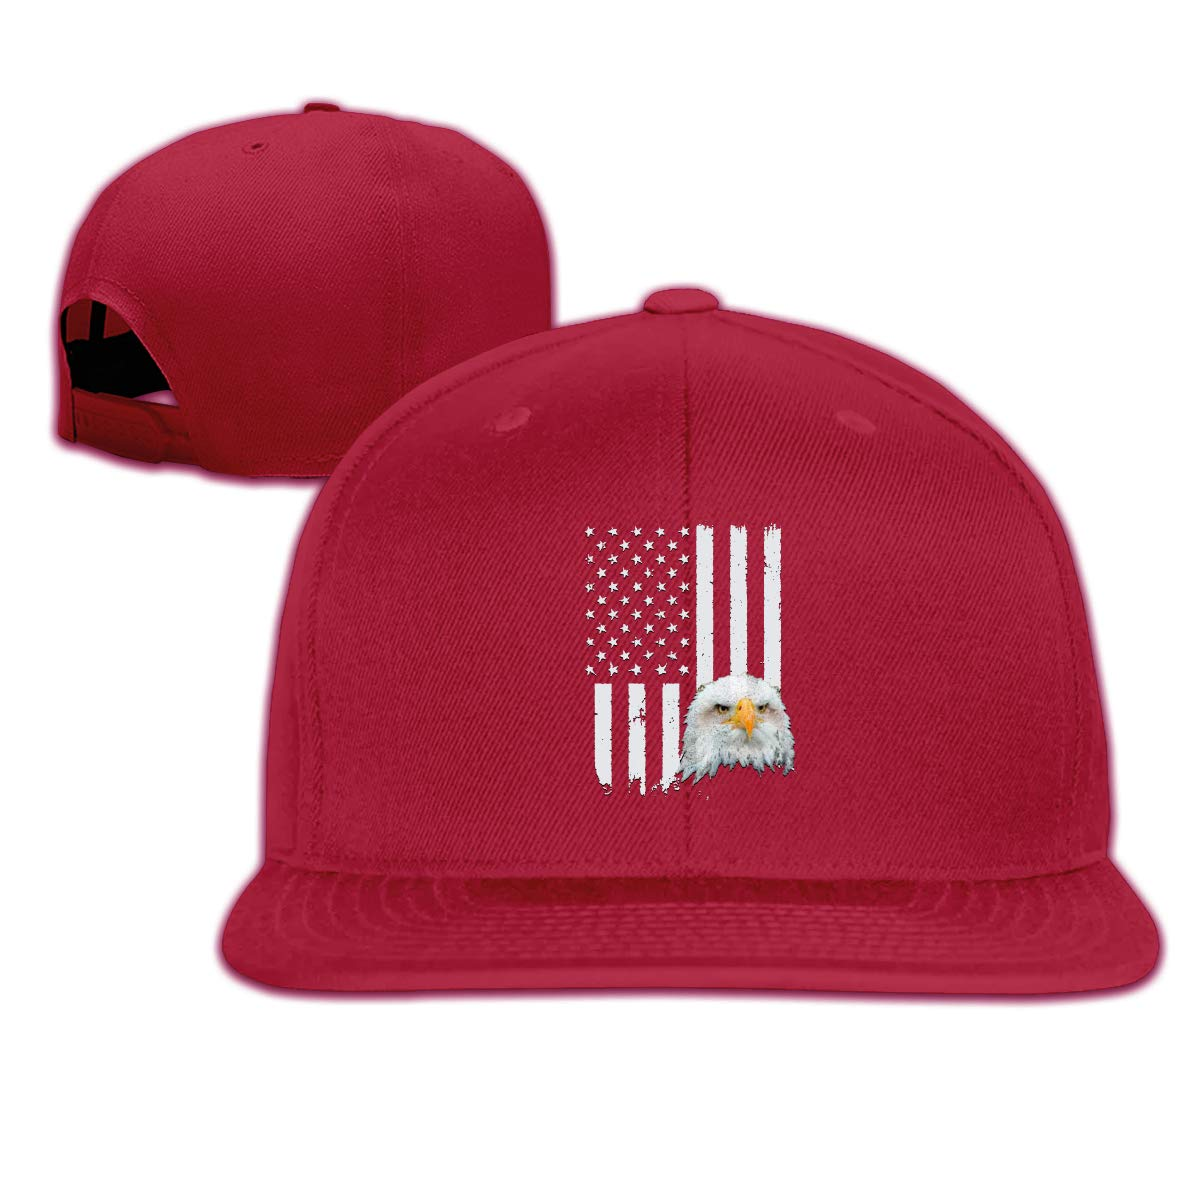 Baseball Cap White Plain Classic Retro Hip Hop Flat Peak Snapback Adjustable Hat